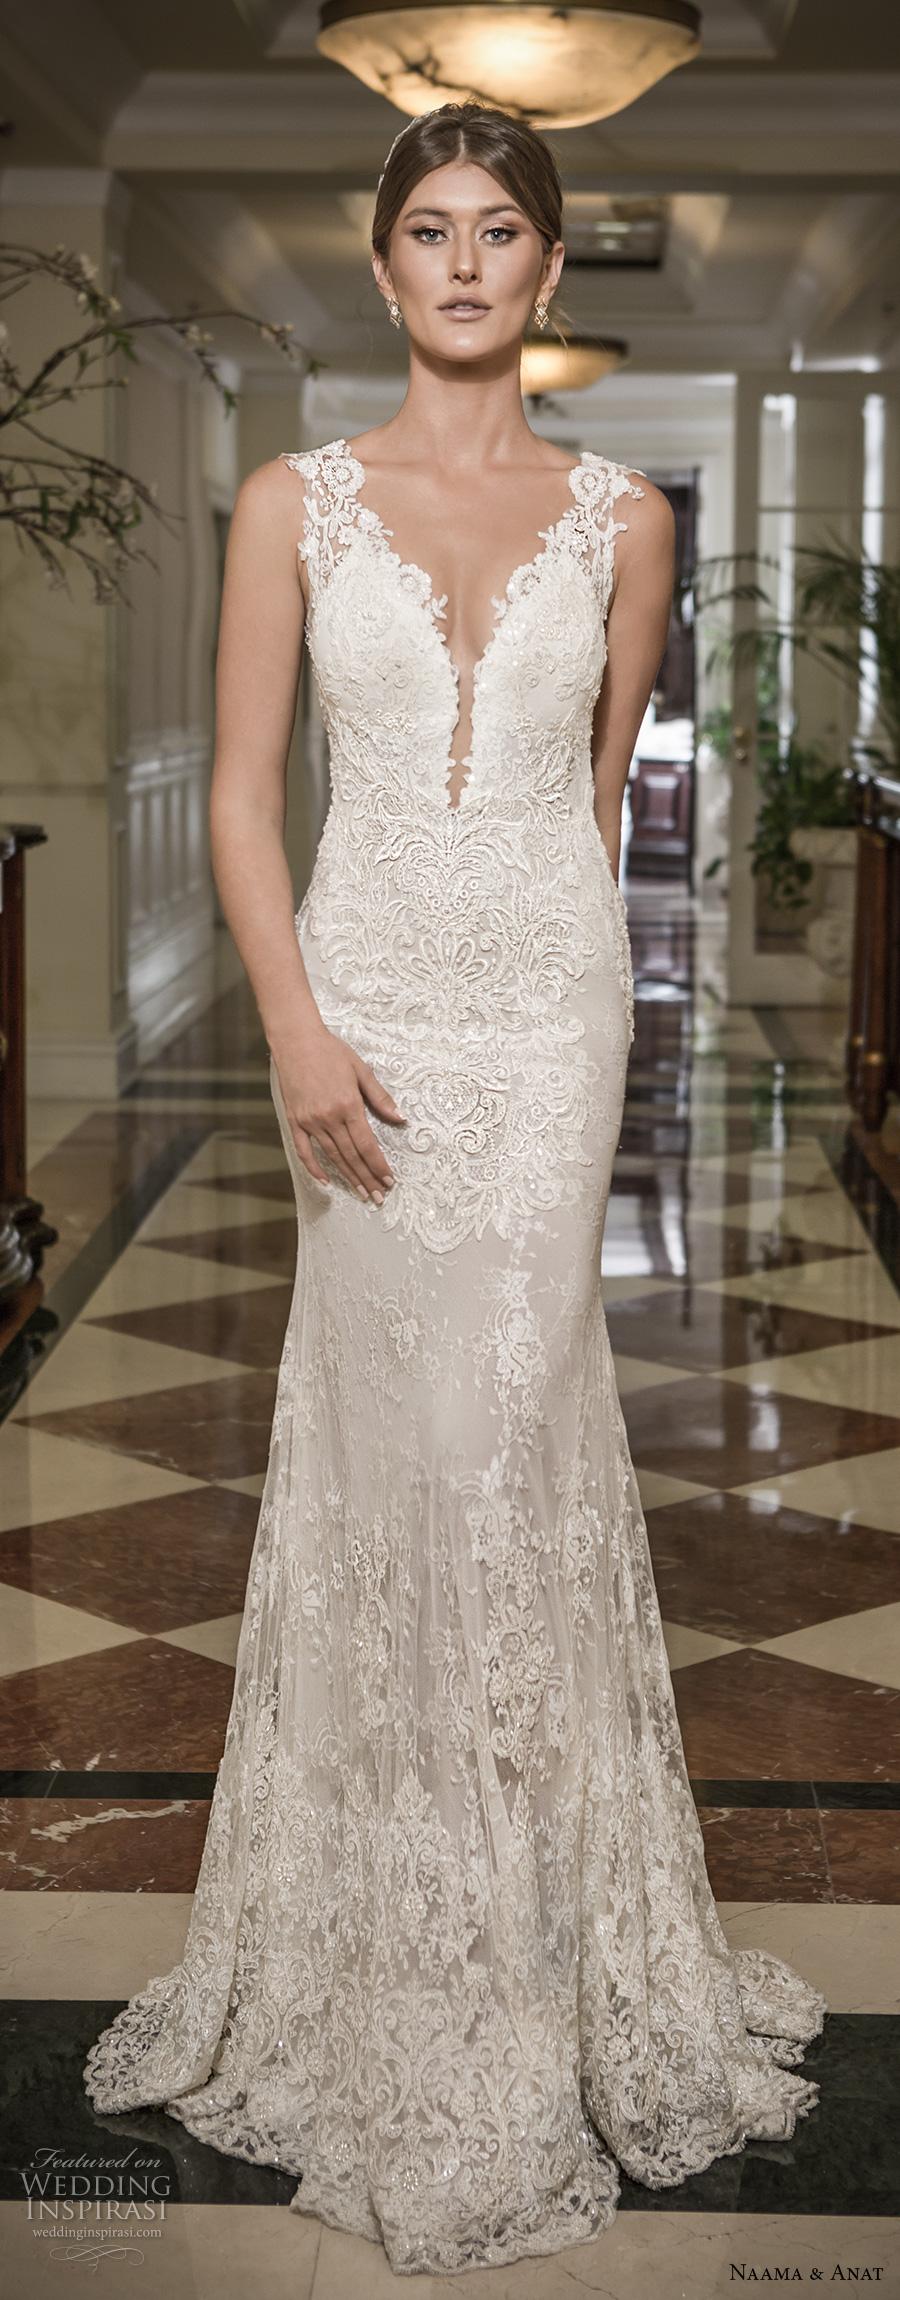 naama and anat 2018 bridal thick lace strap deep plunging sweetheart neckline full embellishment elegant sheath wedding dress open low back sweep train (libertas) mv